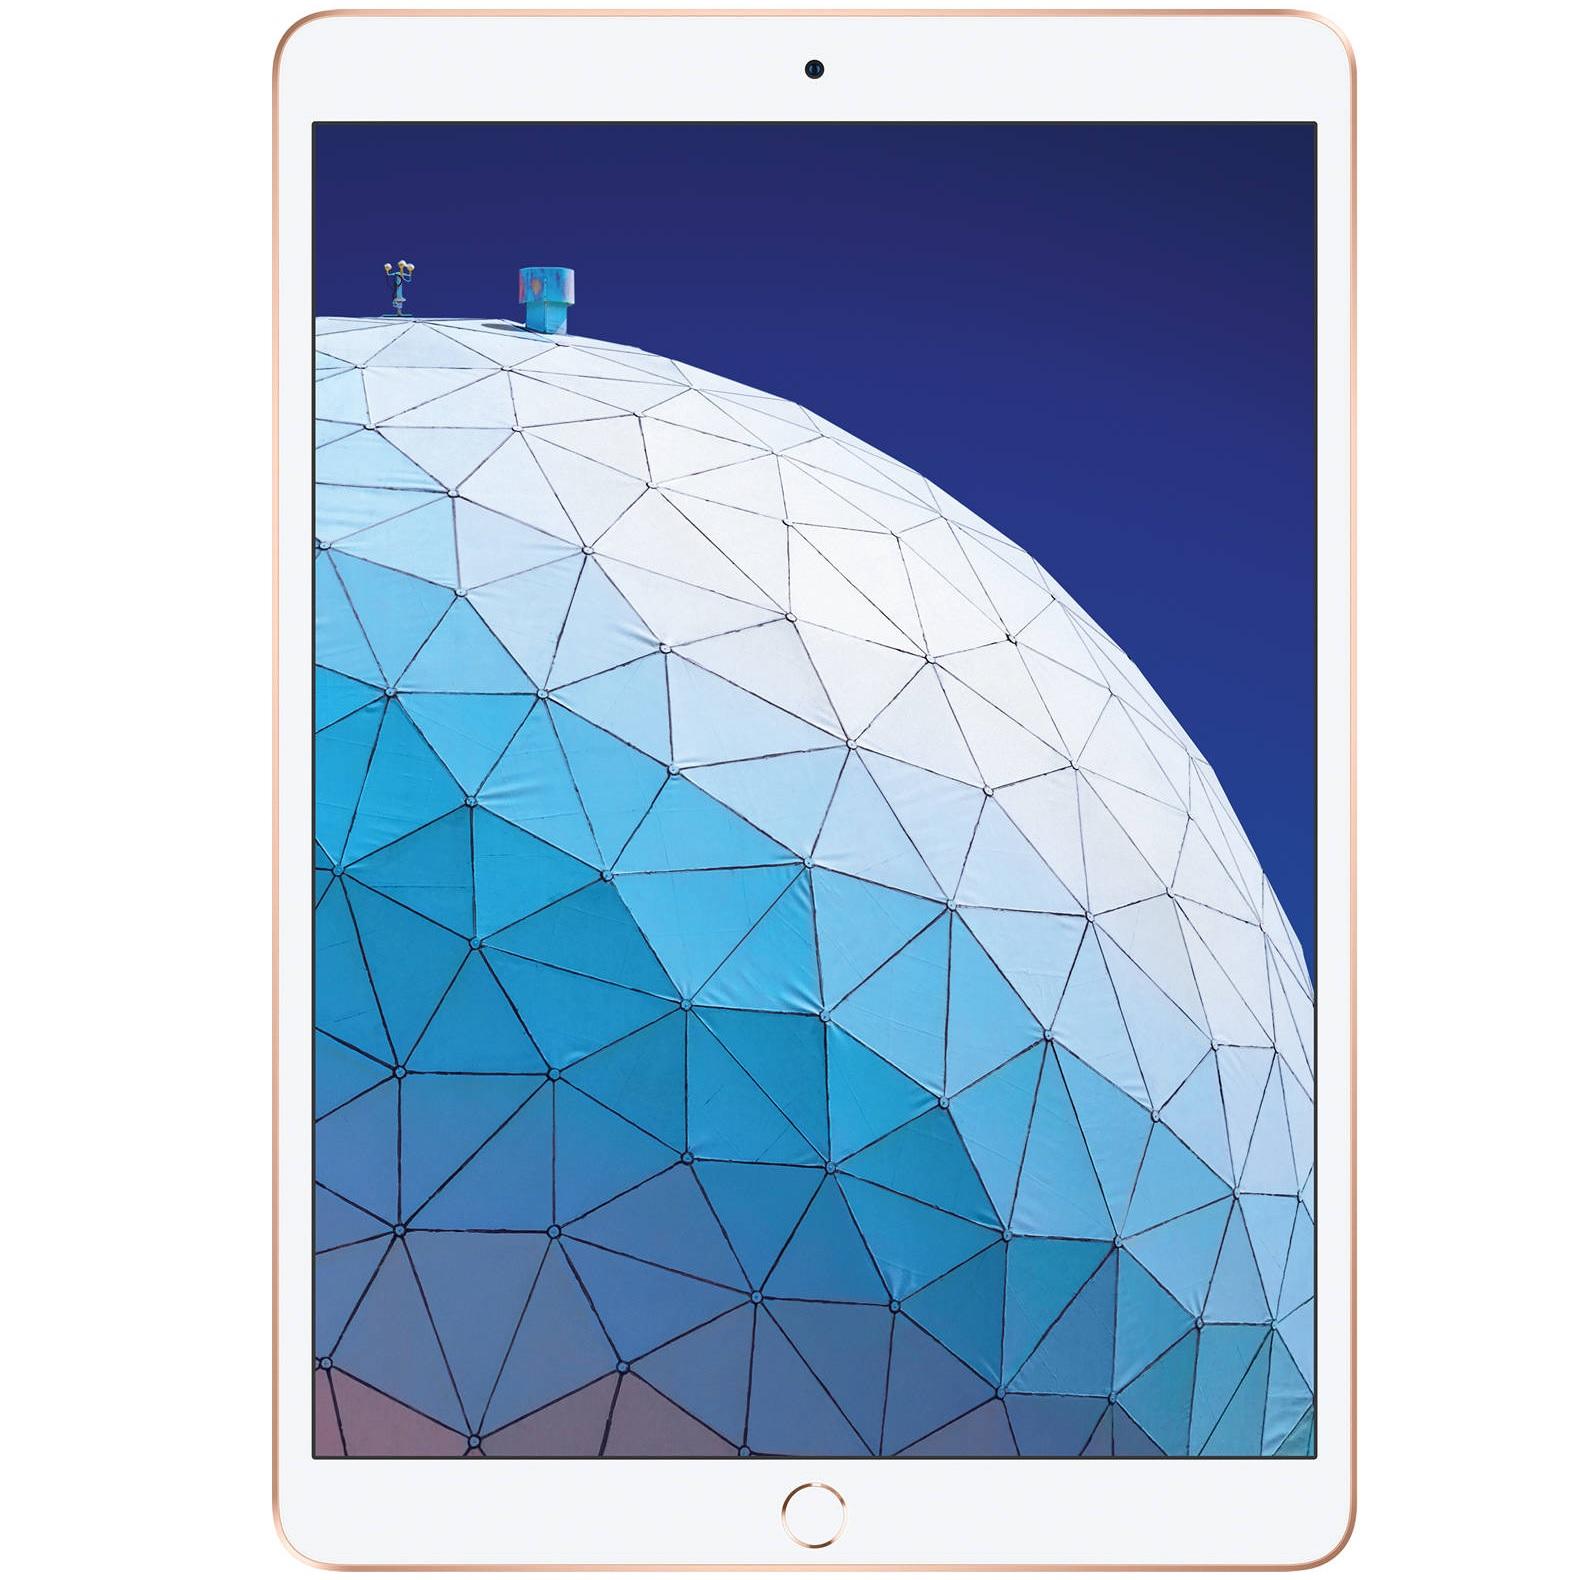 تبلت اپل مدل iPad Air 2019 10.5 inch 4G ظرفیت 64 گیگابایت